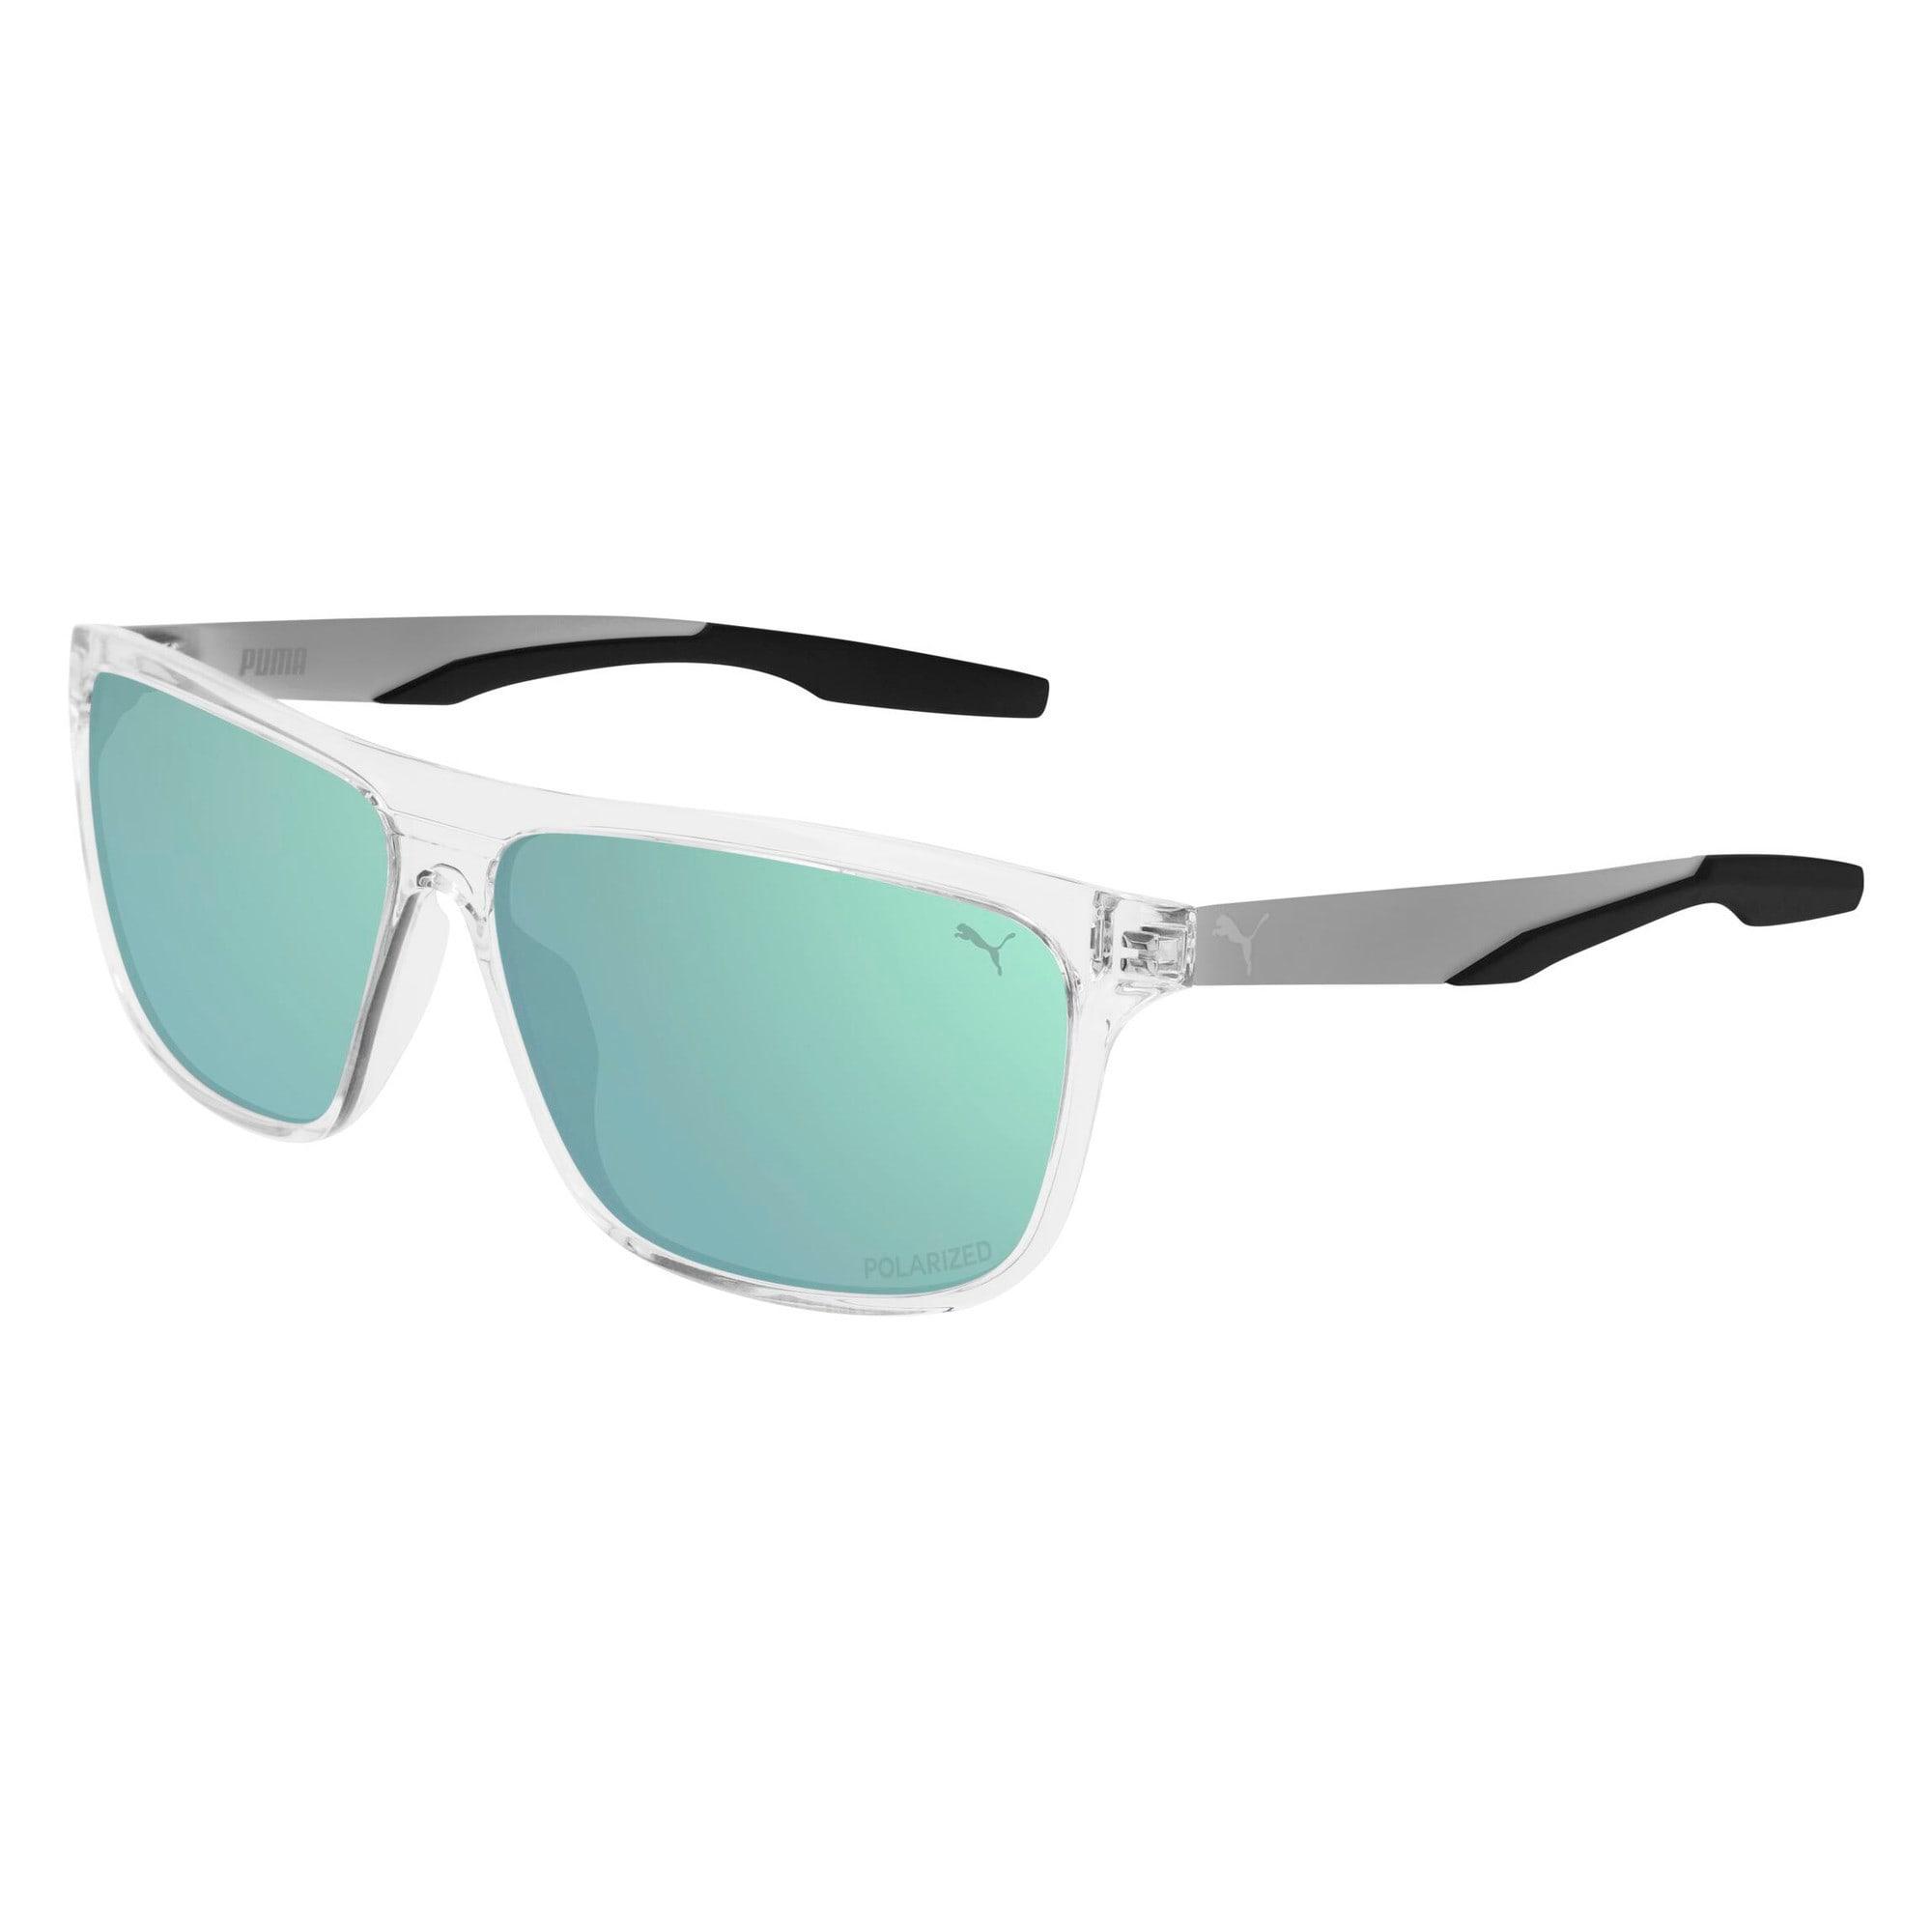 Thumbnail 1 of Laguna Sunglasses, CRYSTAL, mediano